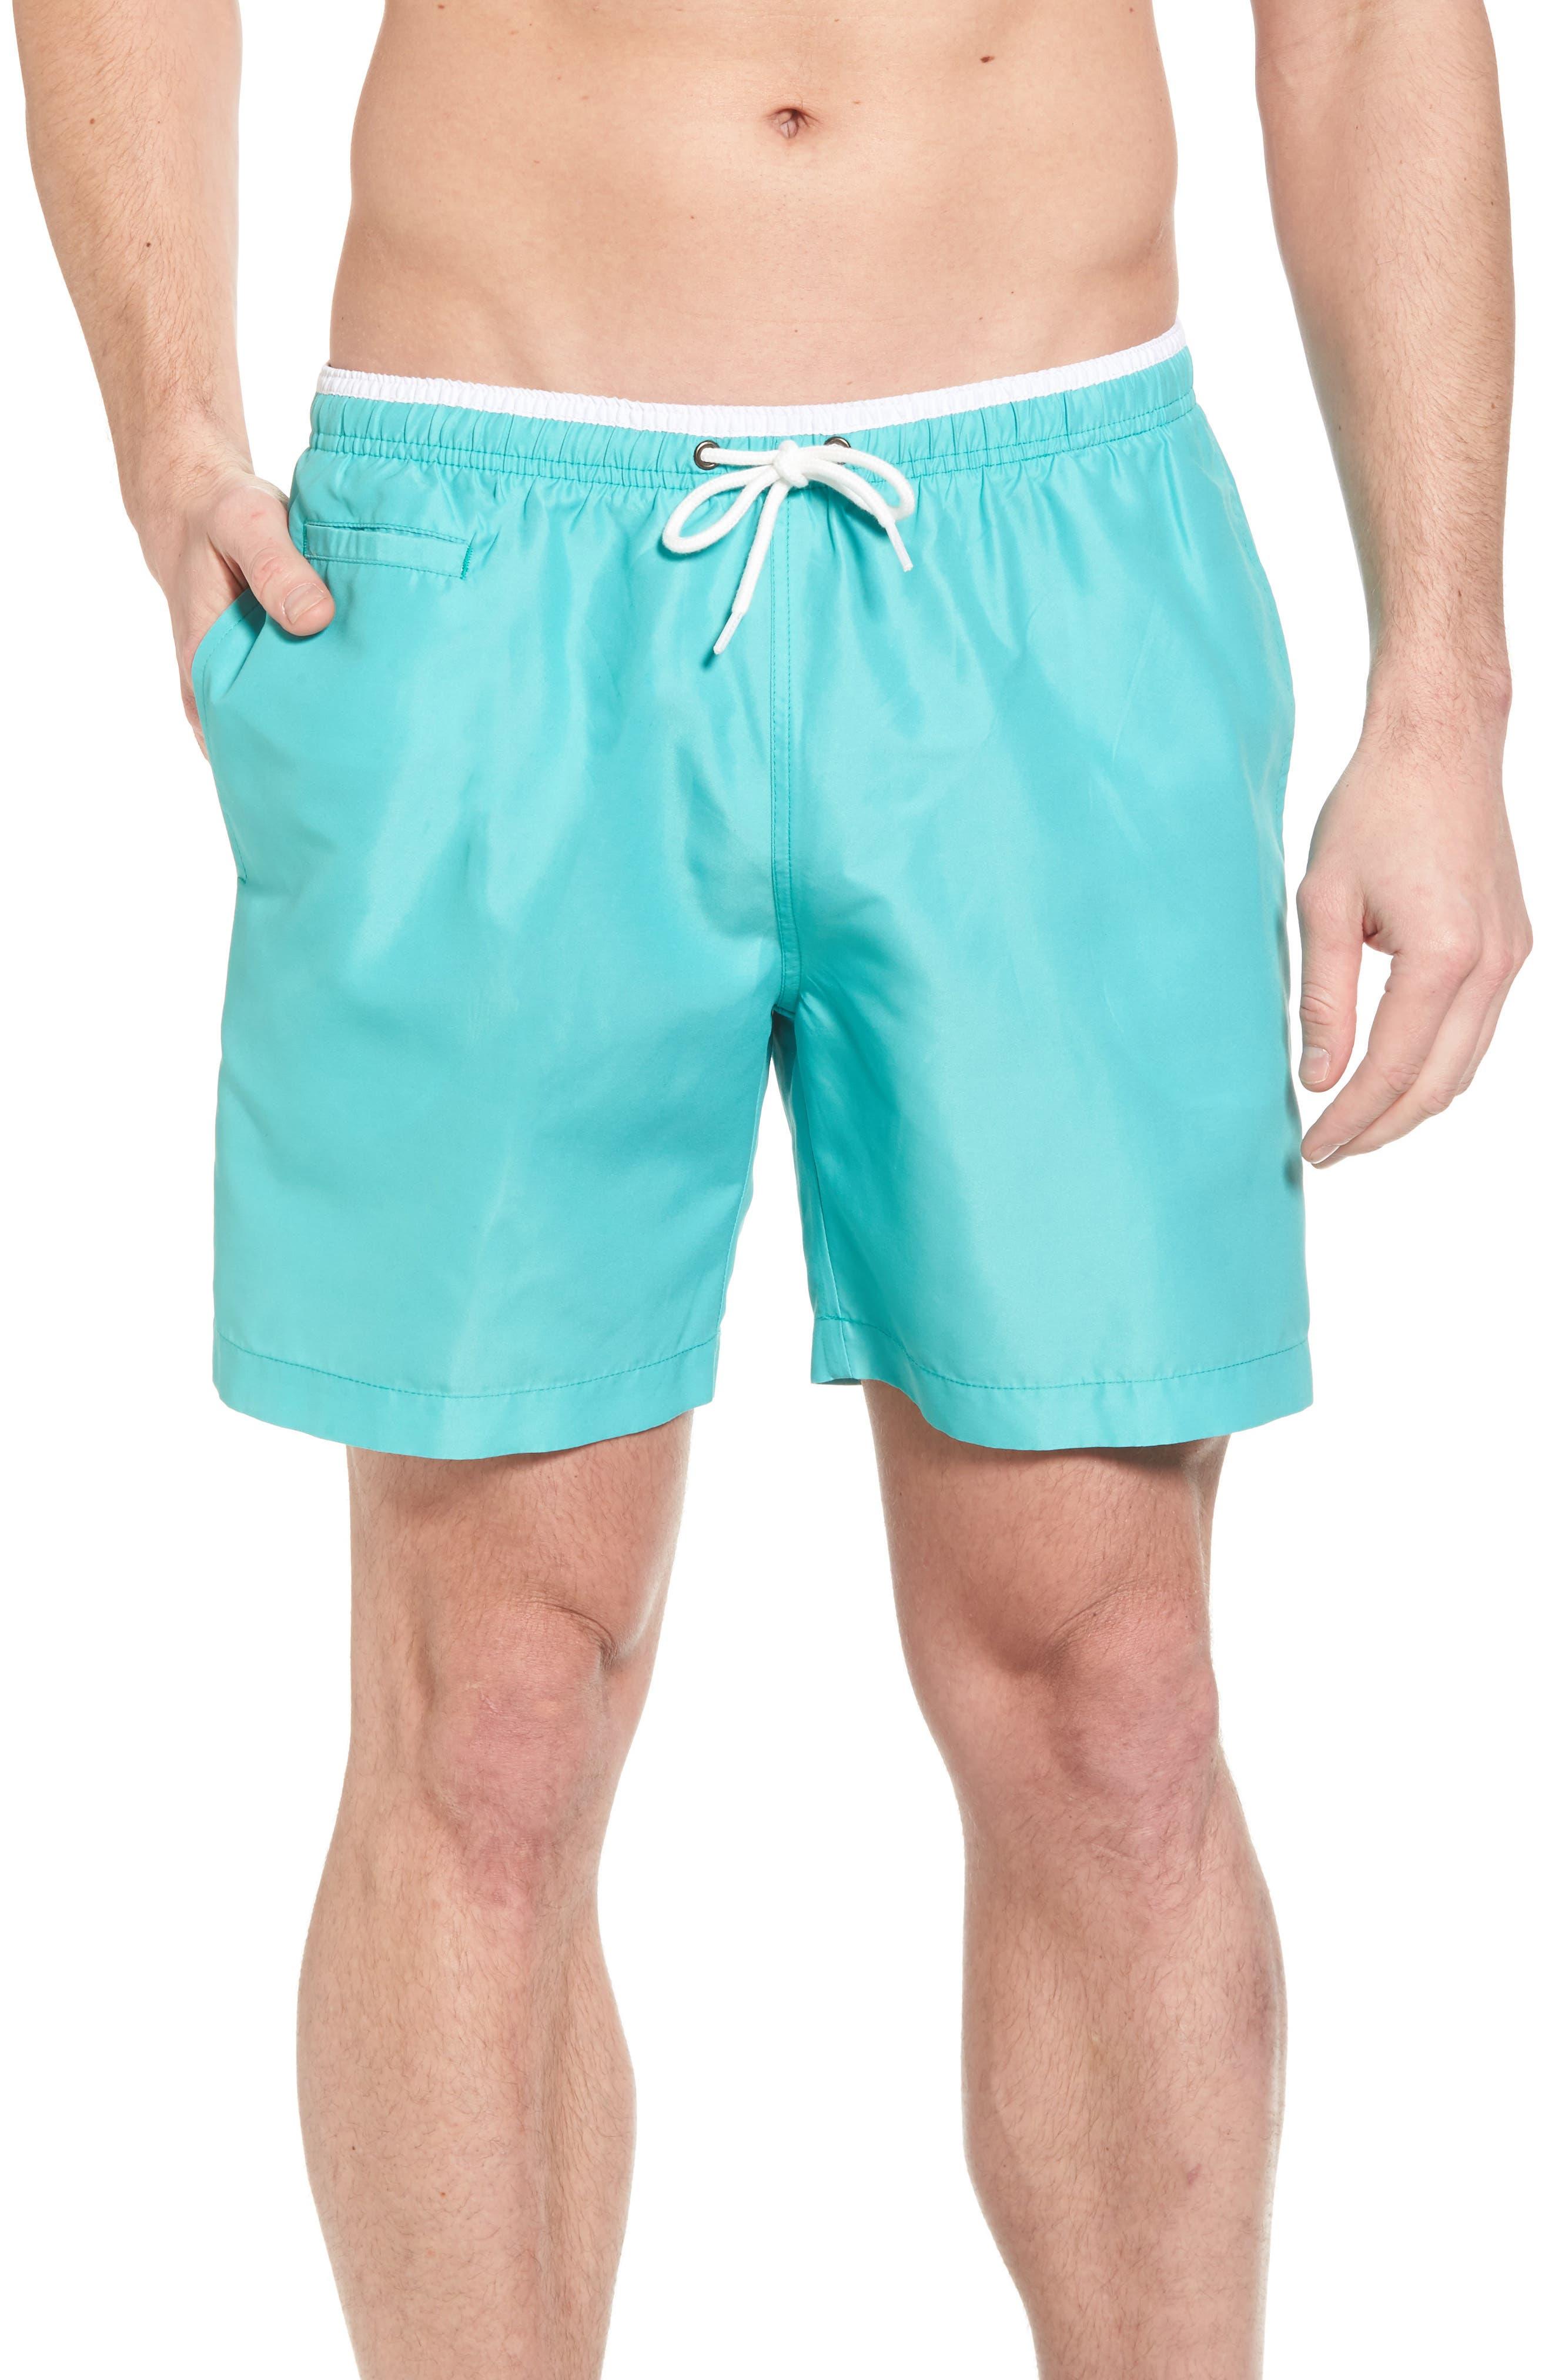 San O Swim Trunks,                         Main,                         color, 306